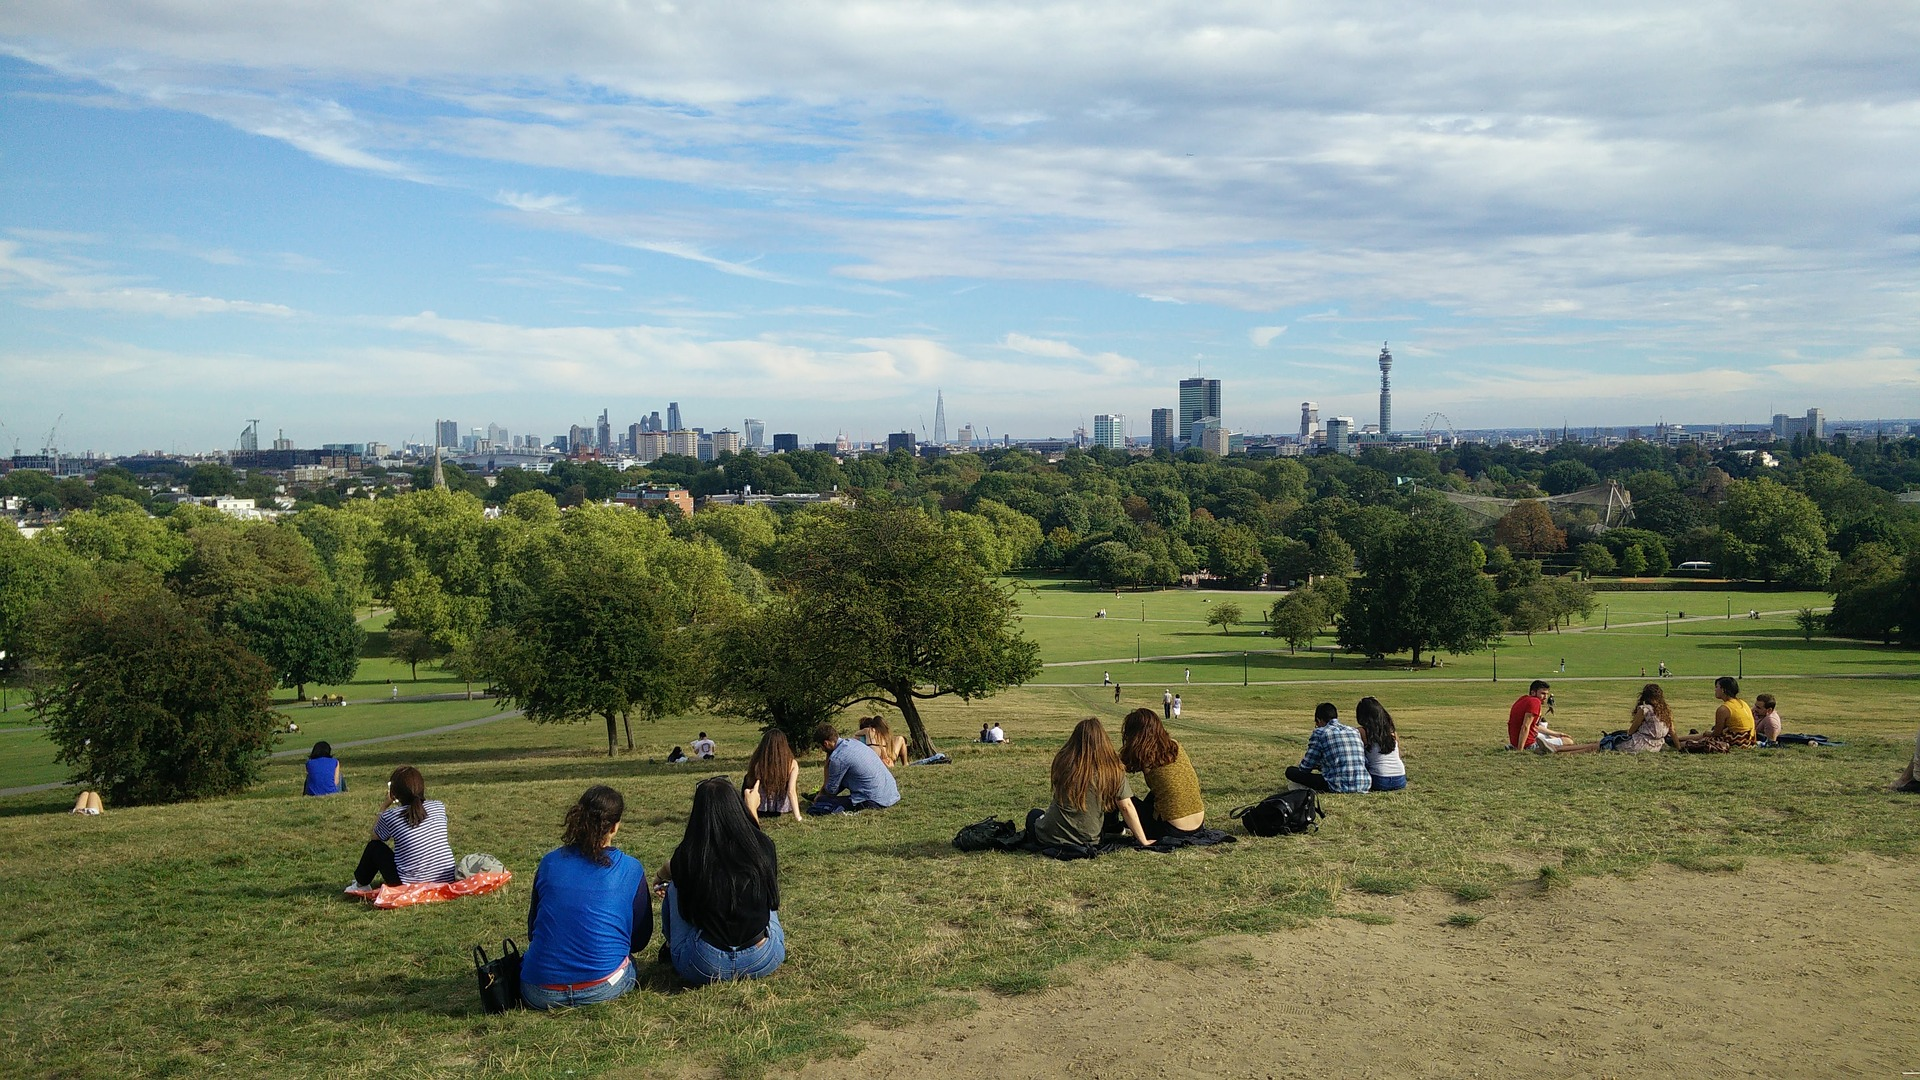 London City Pass günstig ab 85,36€ - Sightseeing Tour richtig planen